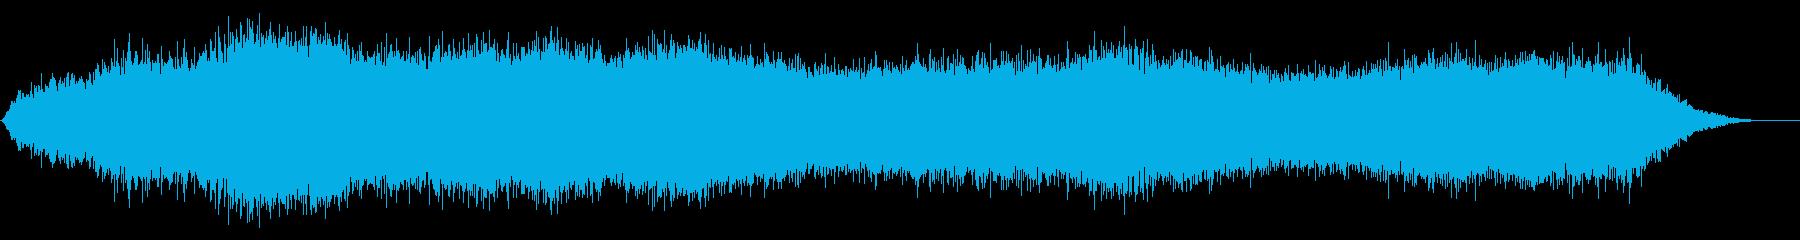 drone23の再生済みの波形